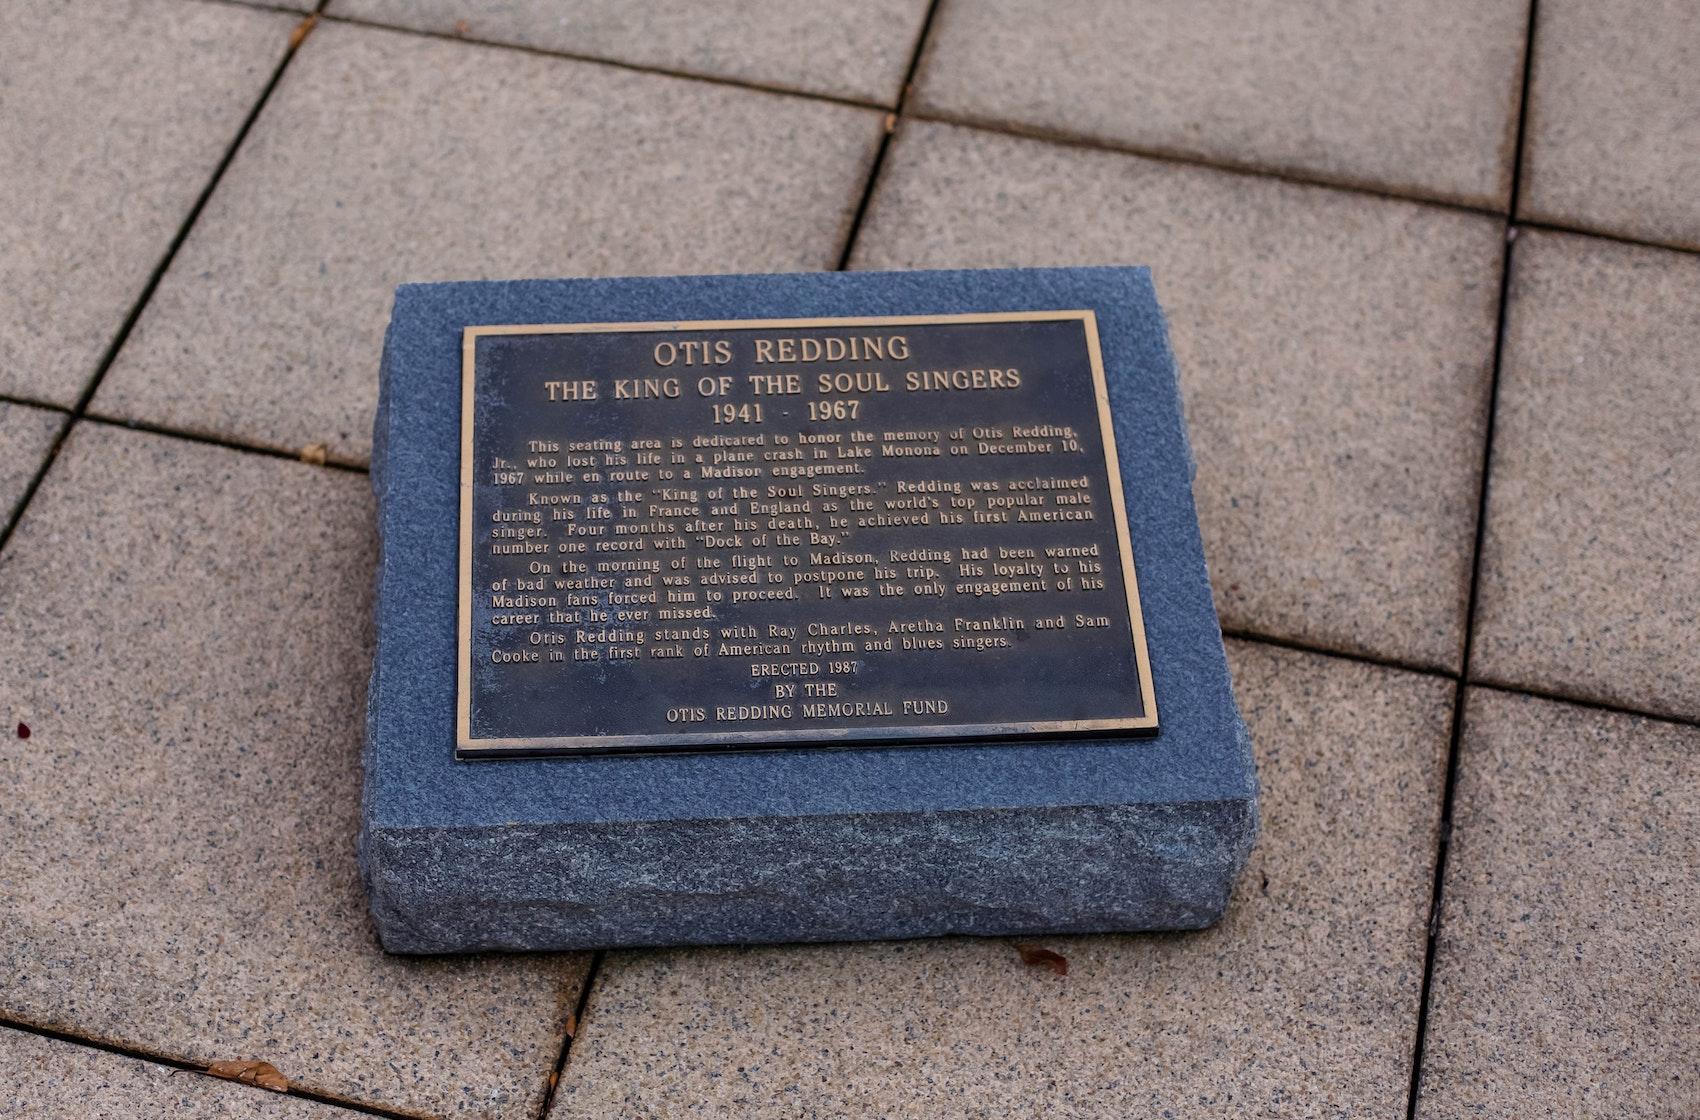 The plaque memorializing Otis Redding on Monona Terrace.